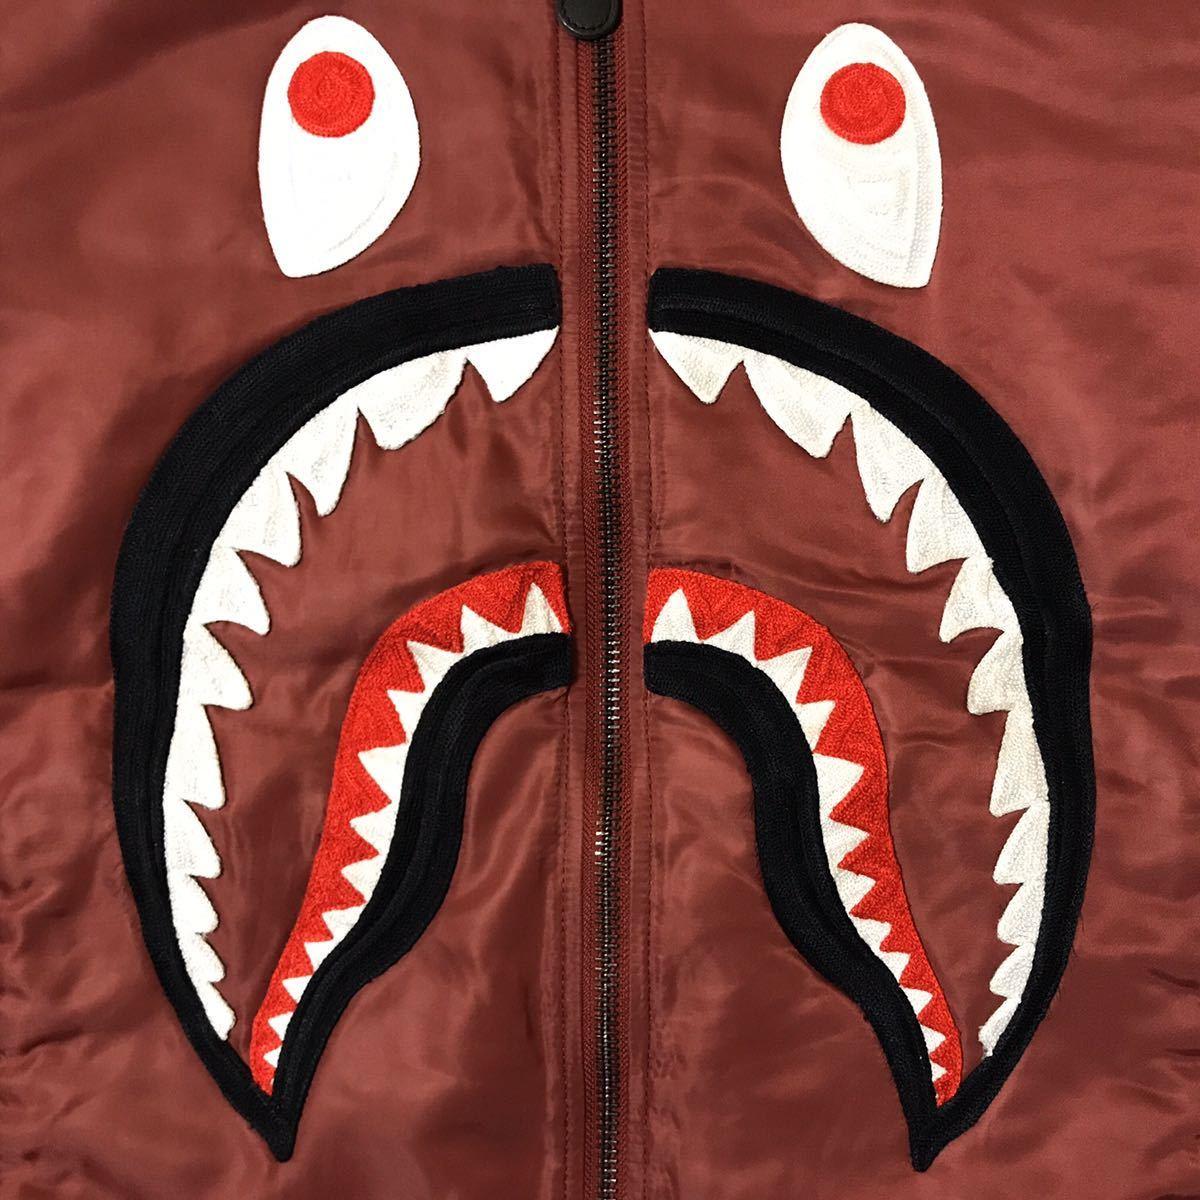 SHARK MA-1 bomber jacket Lサイズ a bathing ape BAPE エイプ ベイプ アベイシングエイプ ジャケット スタジャン varsity WGM